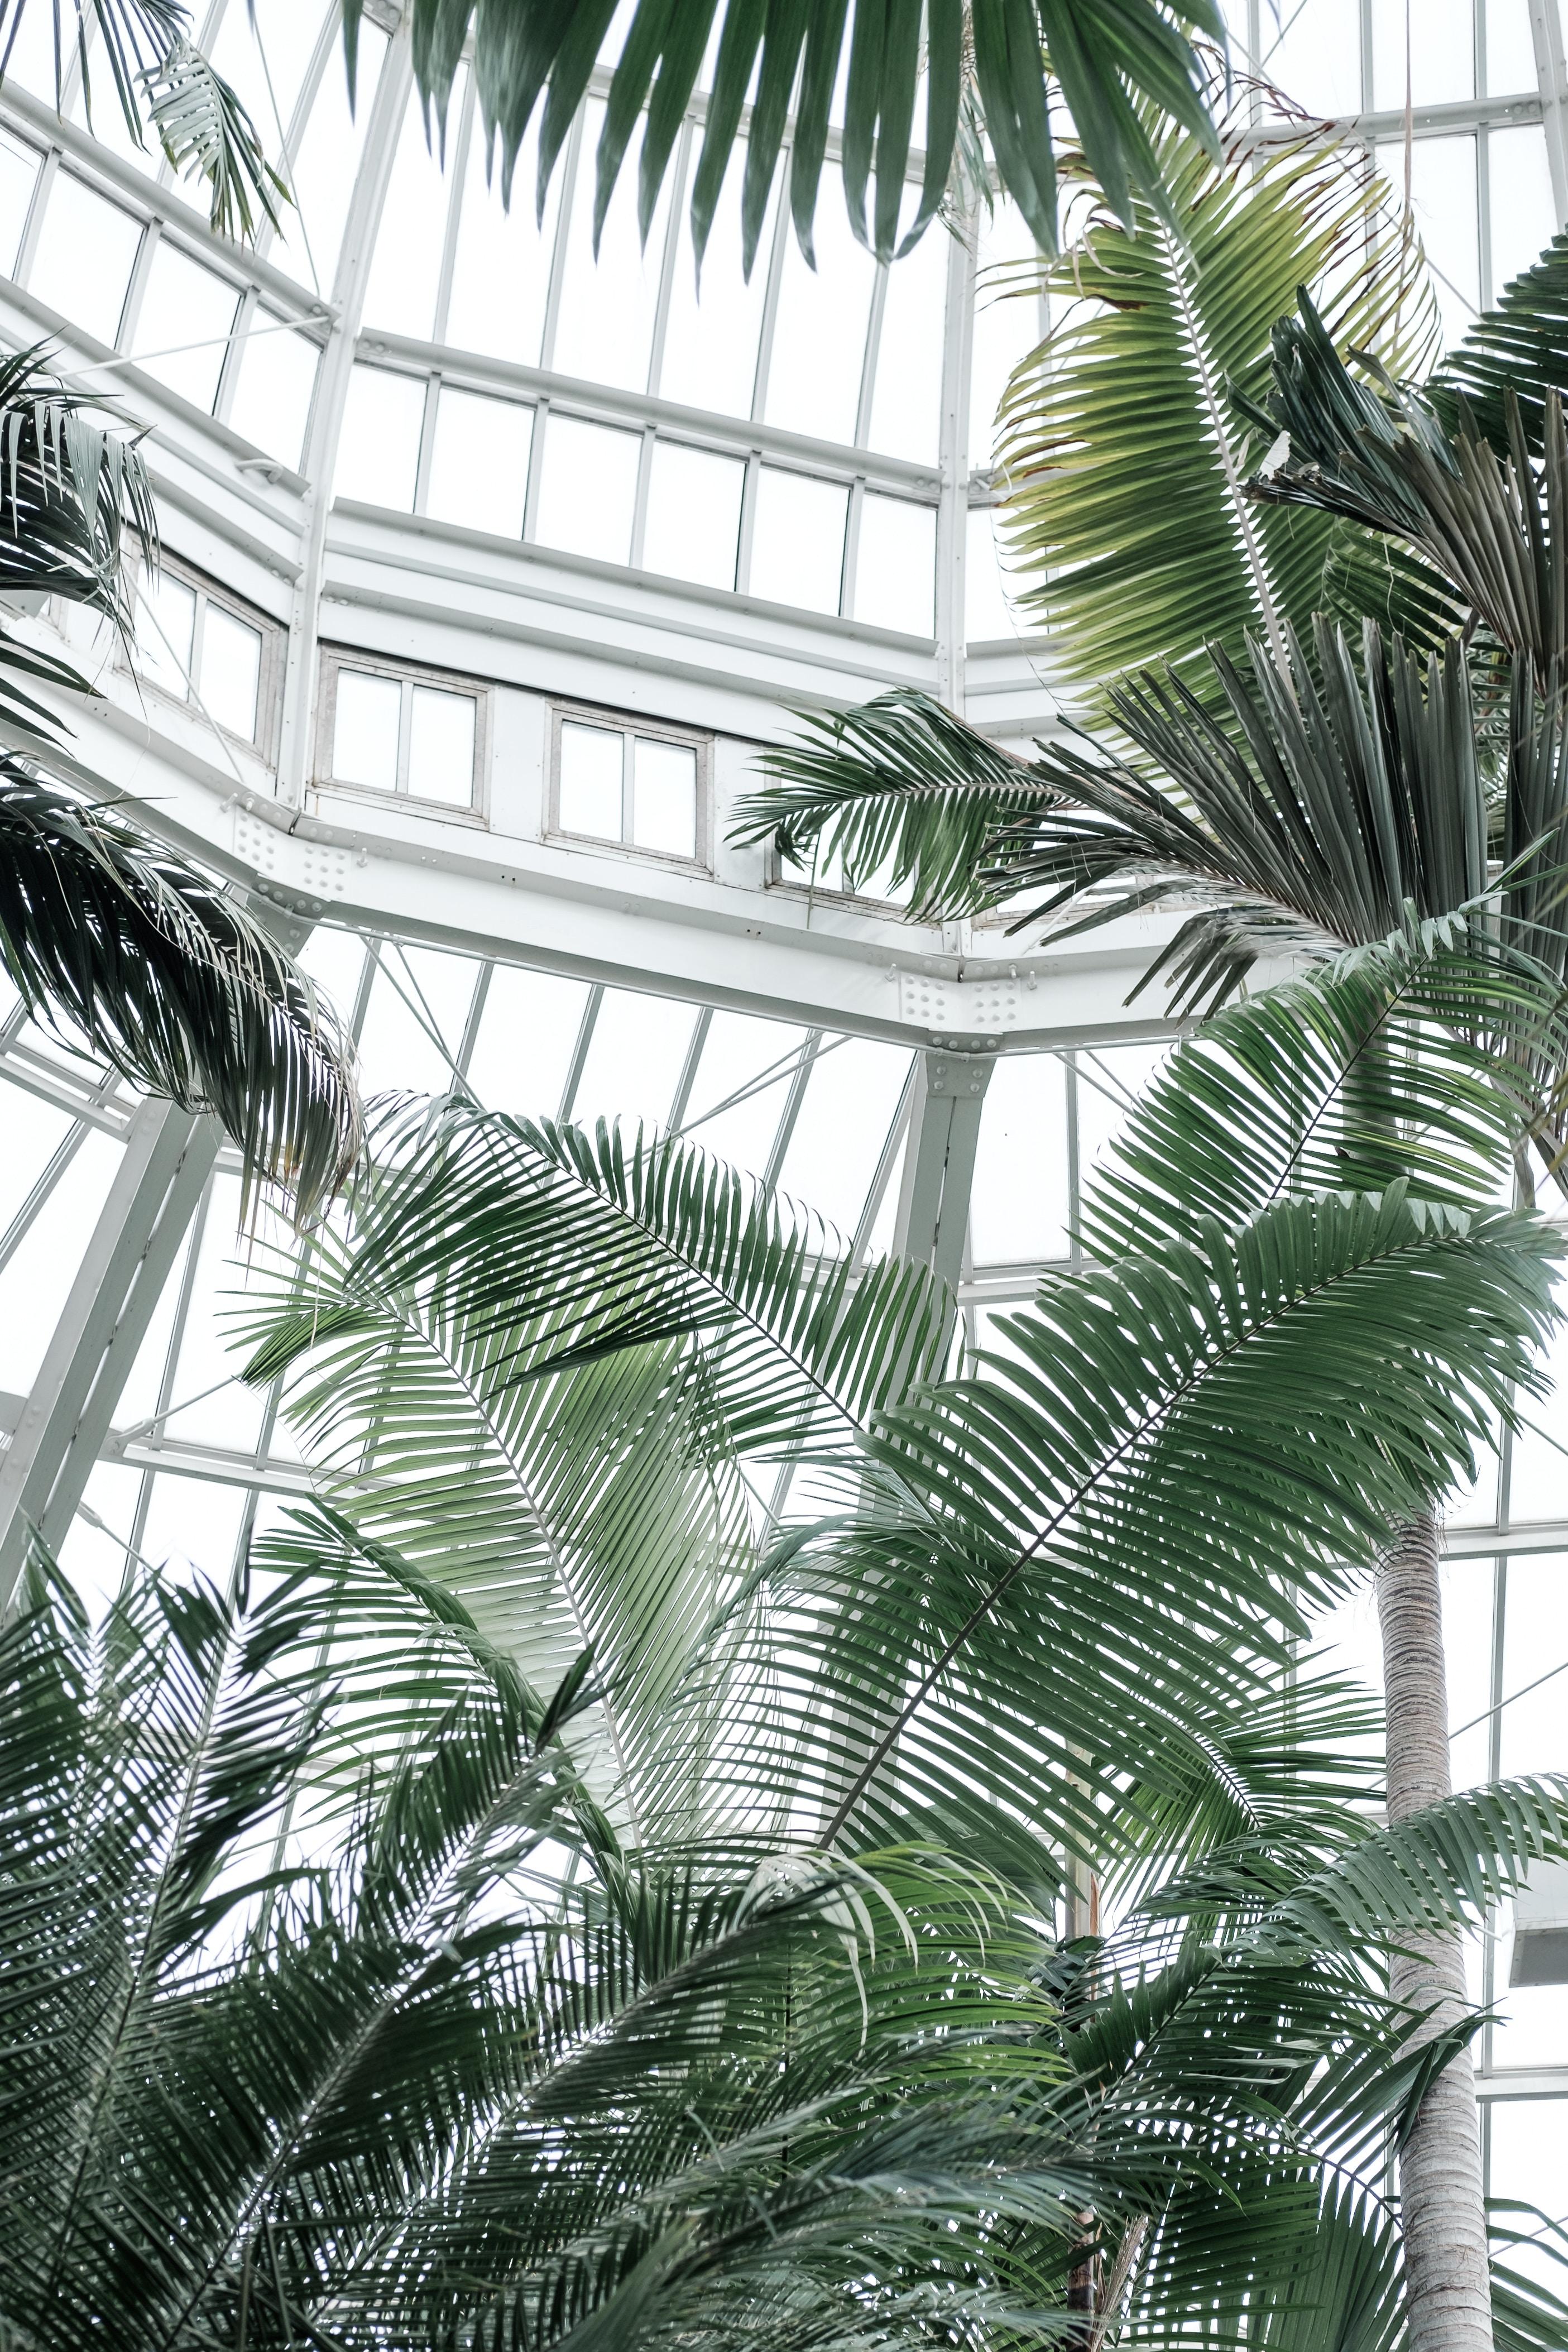 green palm tree inside building